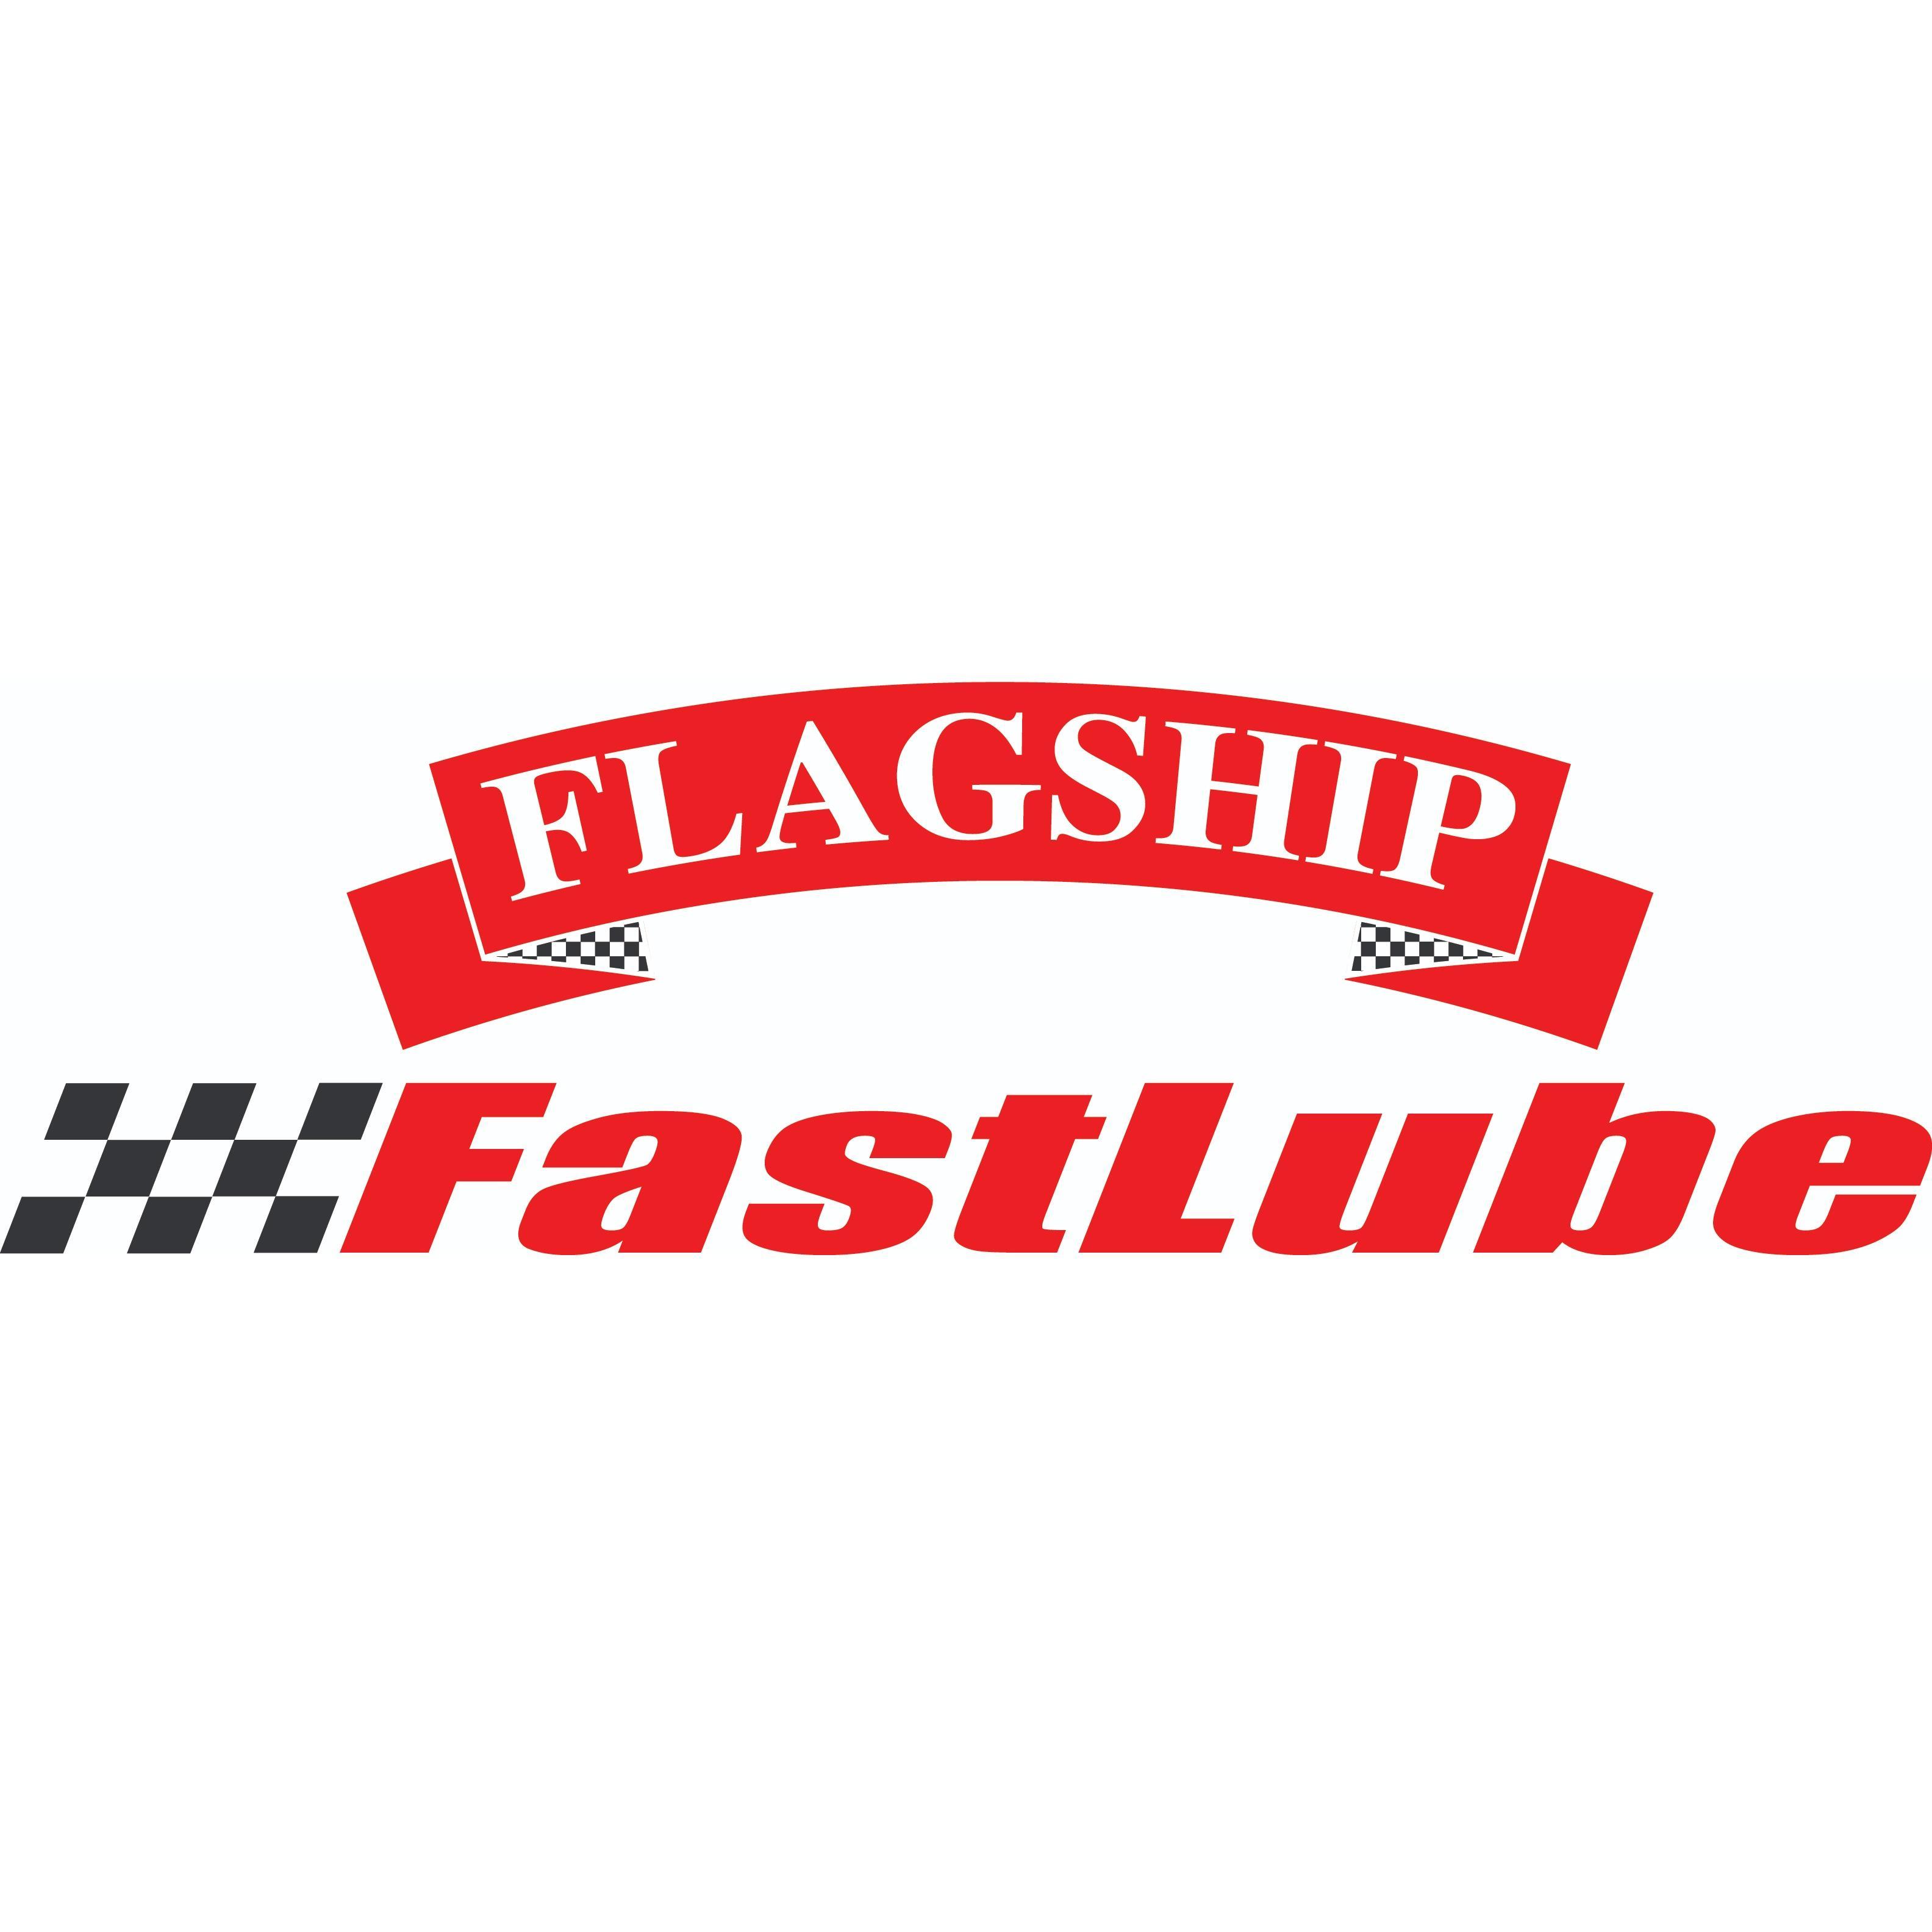 Flagship FastLube